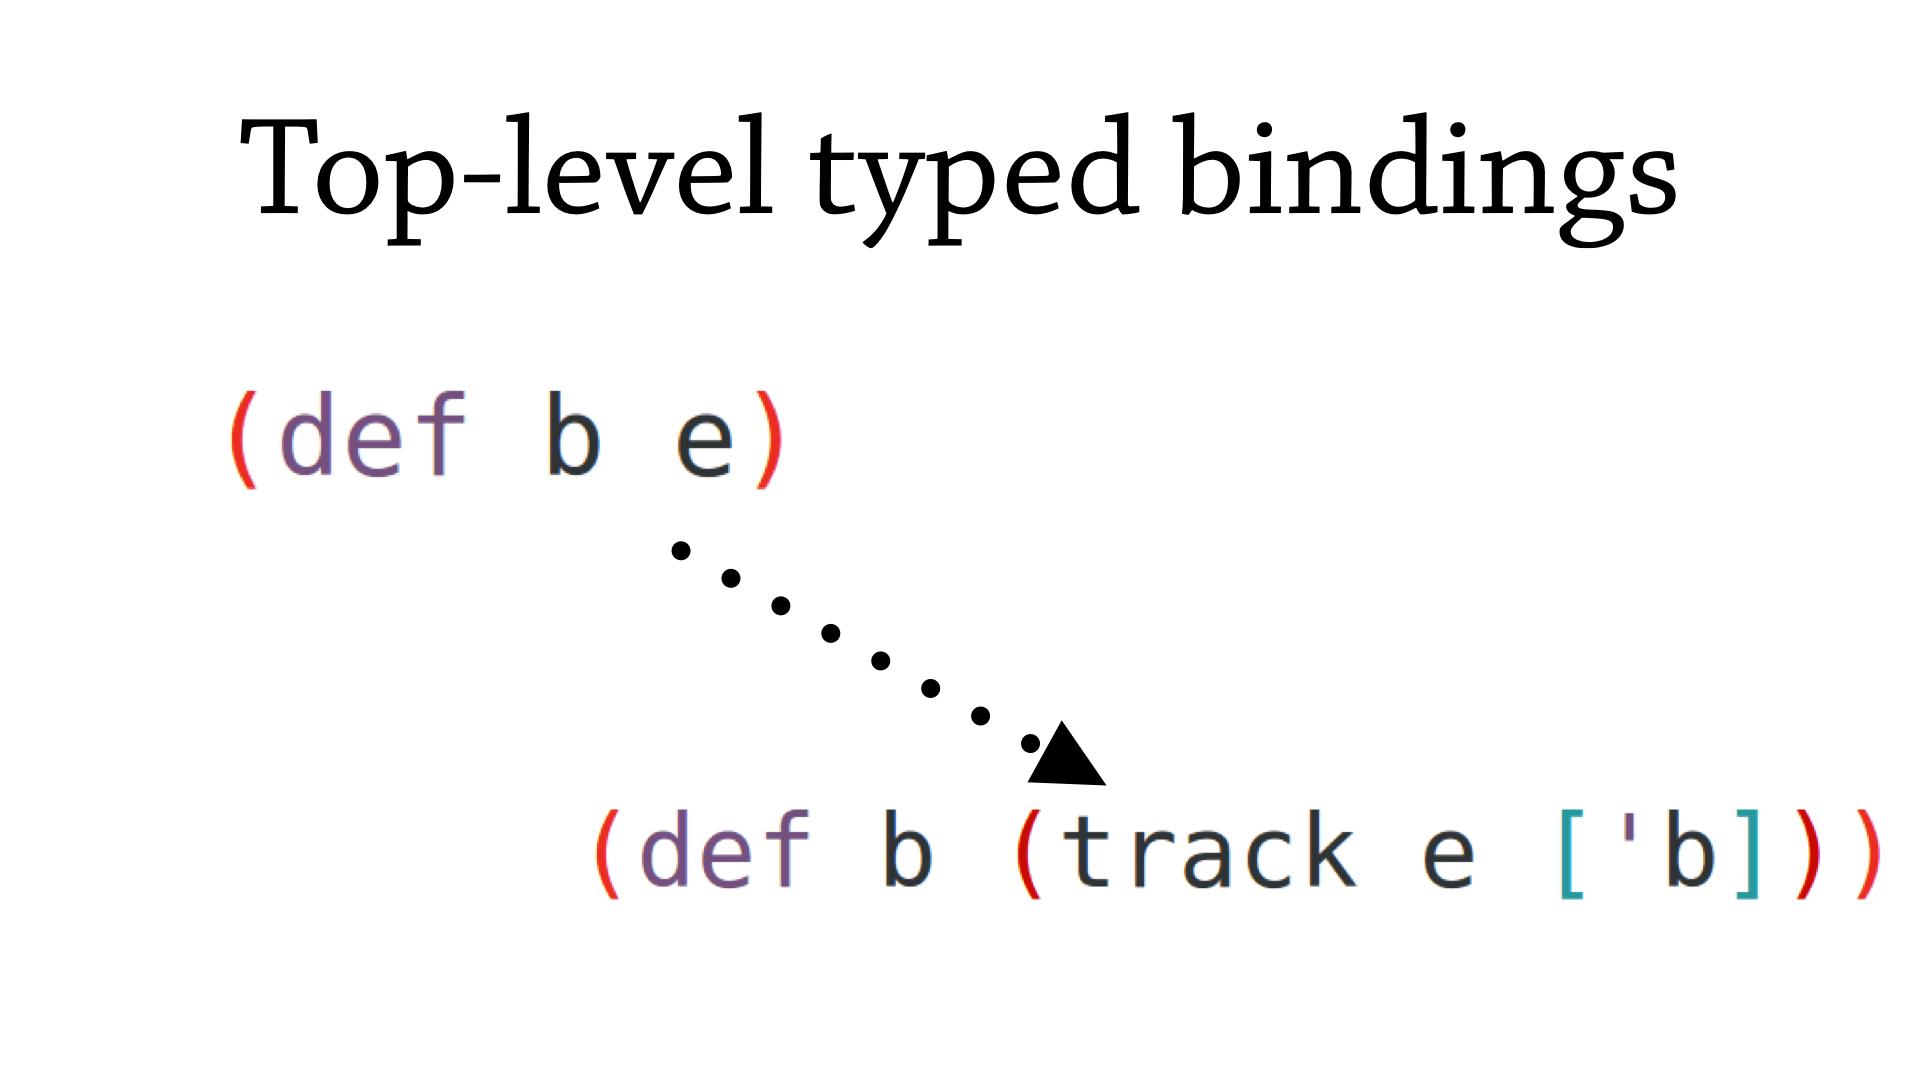 Track top-level binding